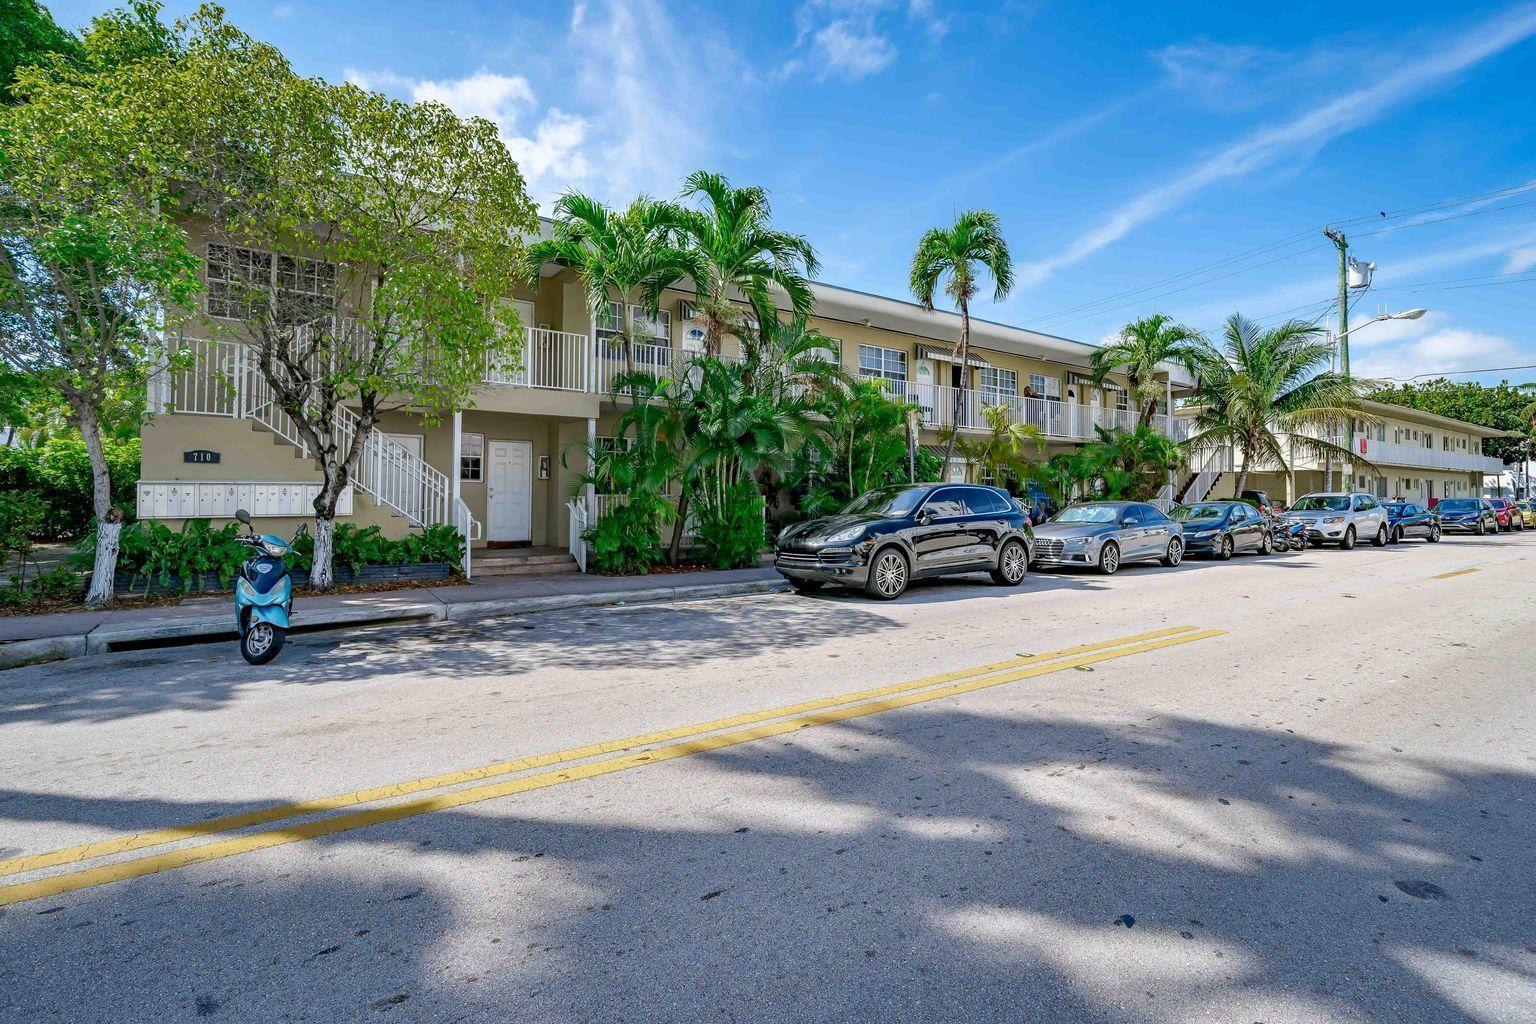 710 7th, Miami Beach, Florida 33139